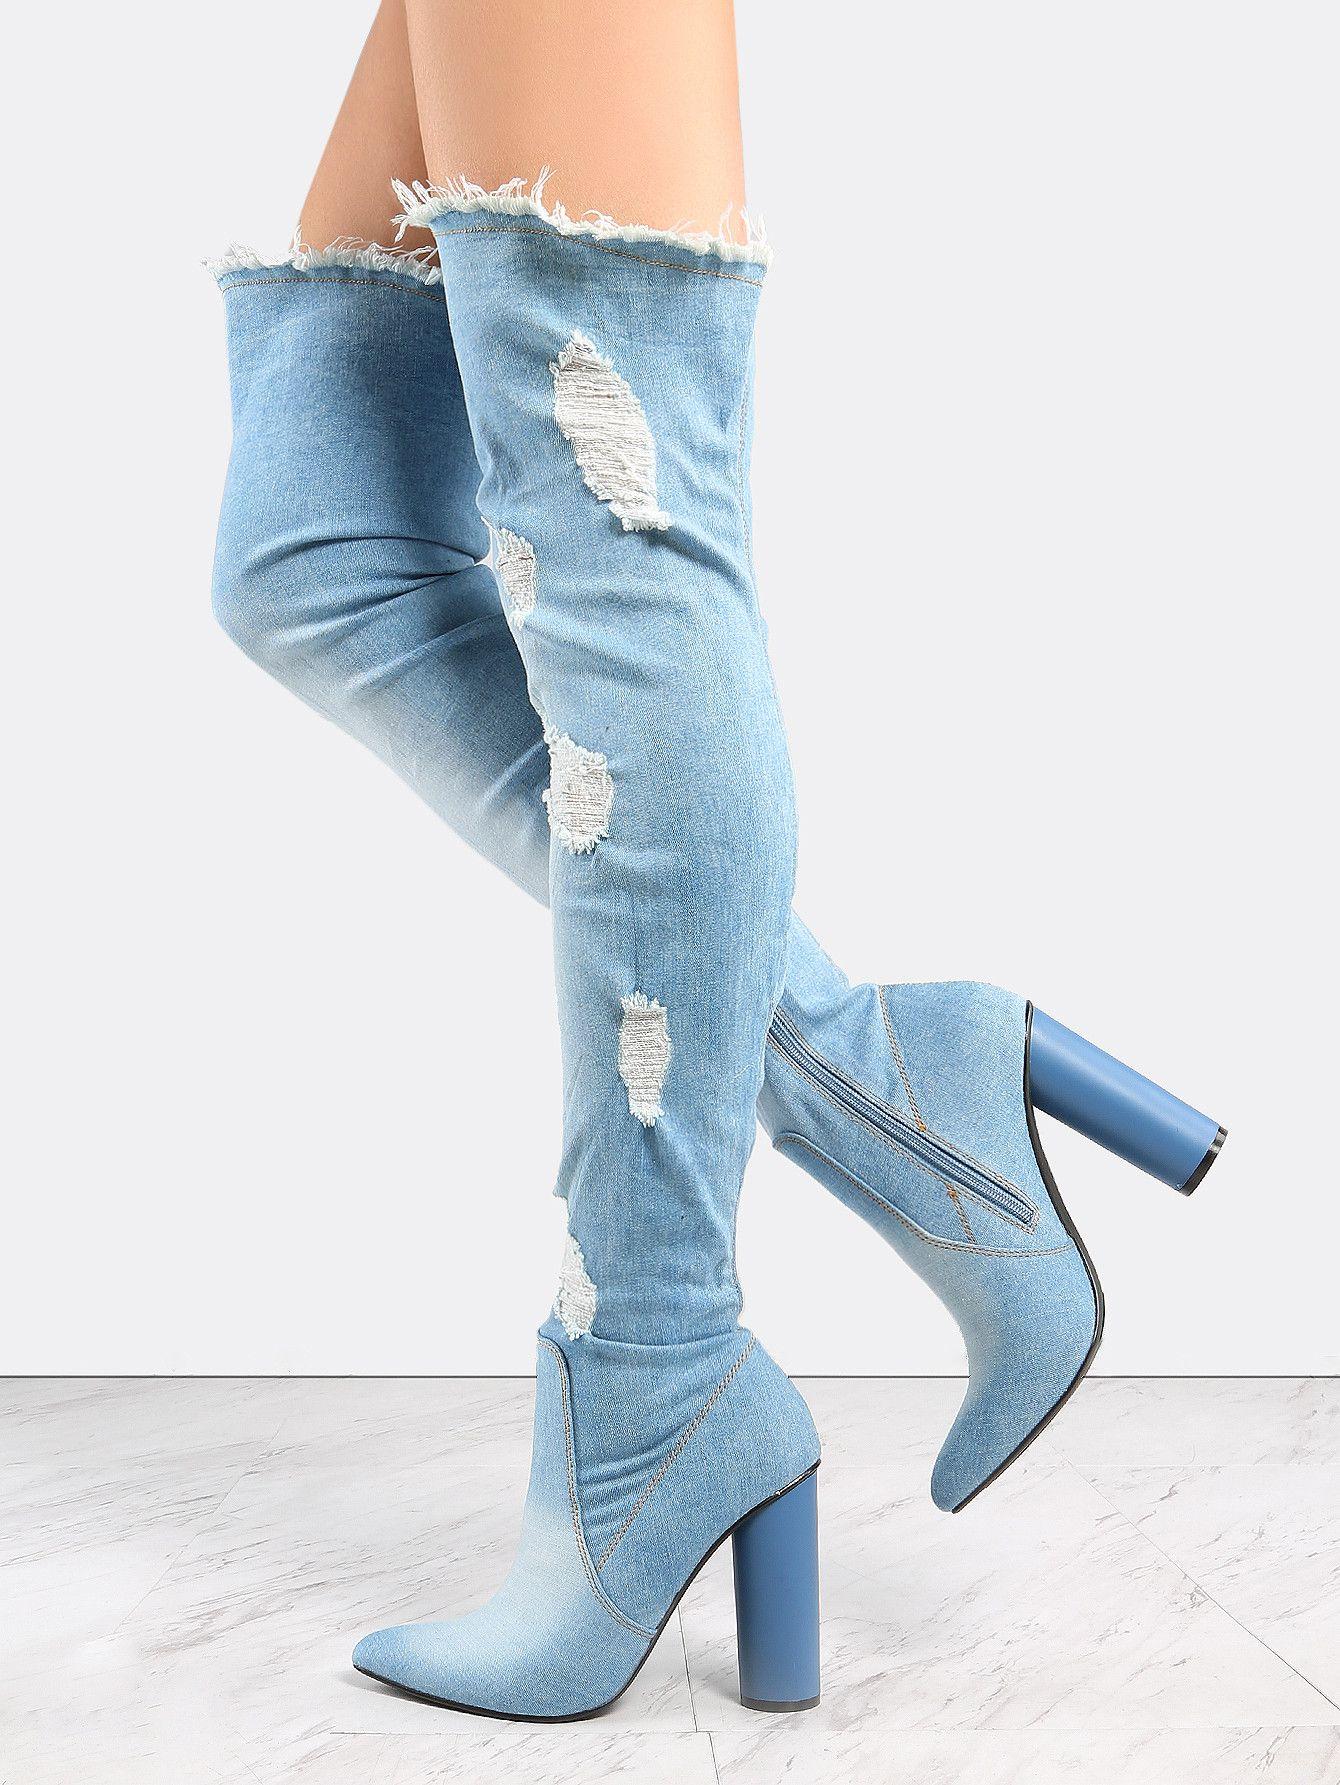 2017 Light Blue Denim Boots Block Heel